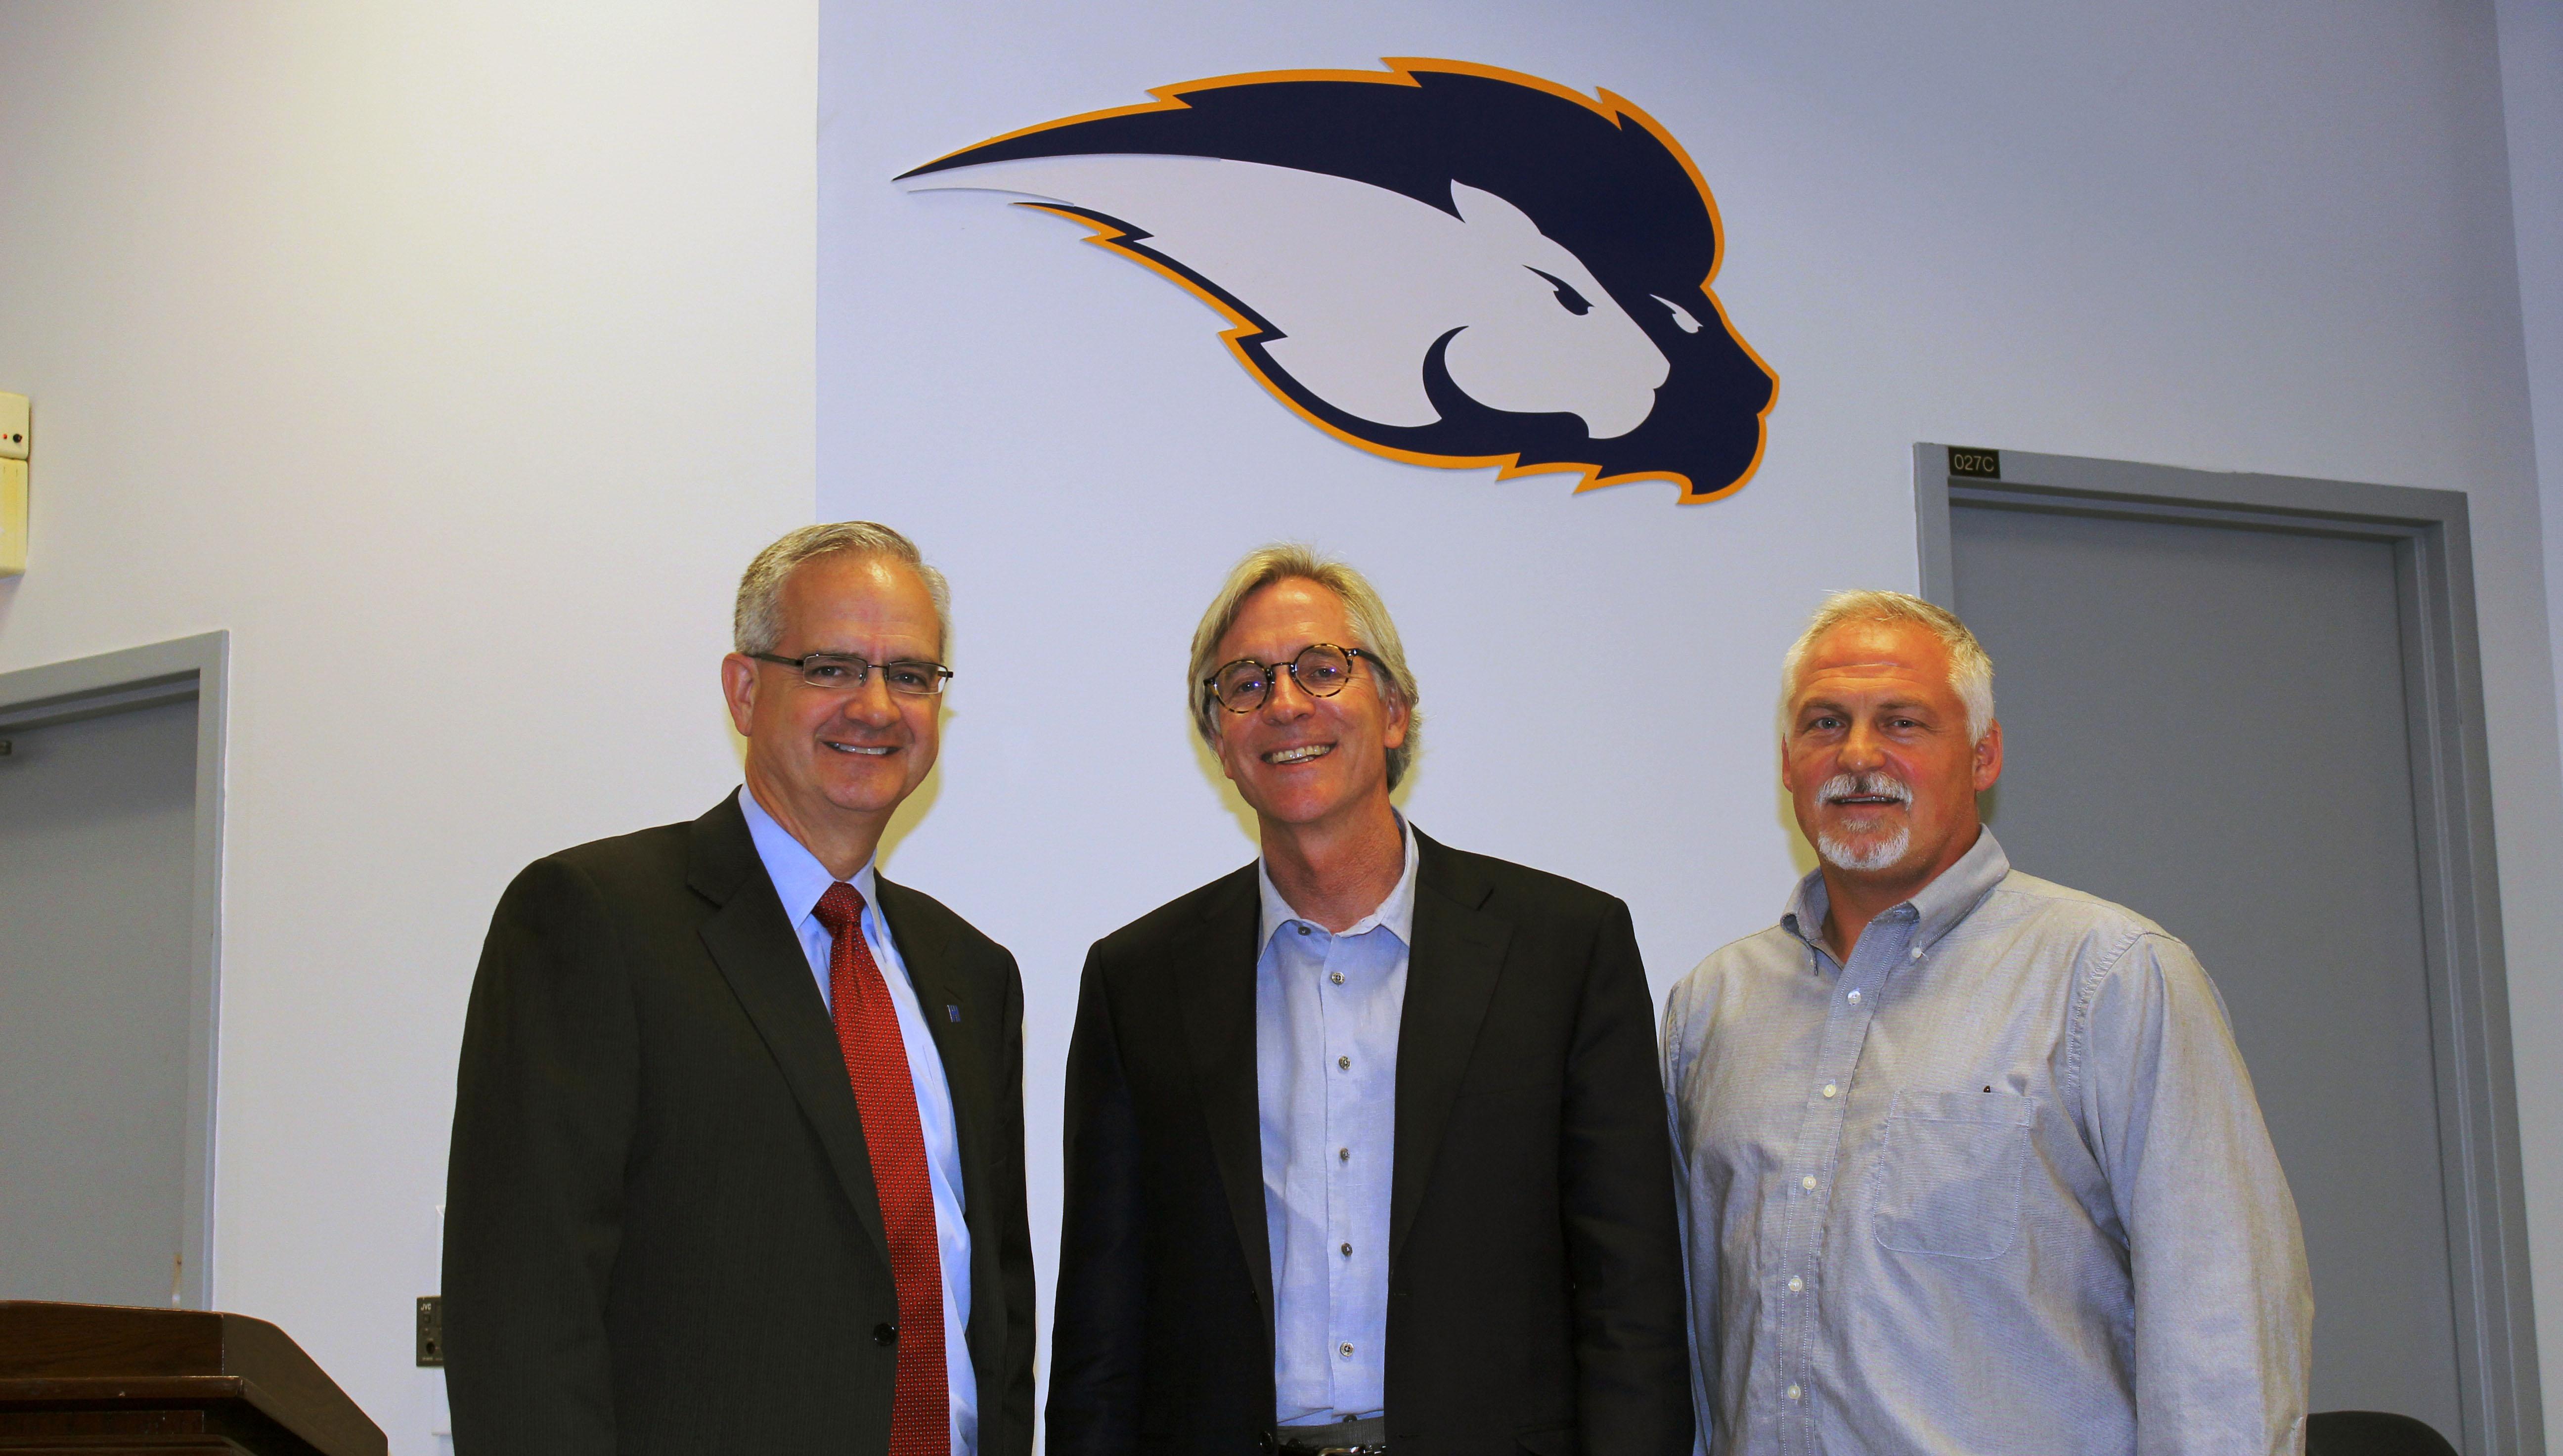 Dr. Brian Hainline Visits Hofstra